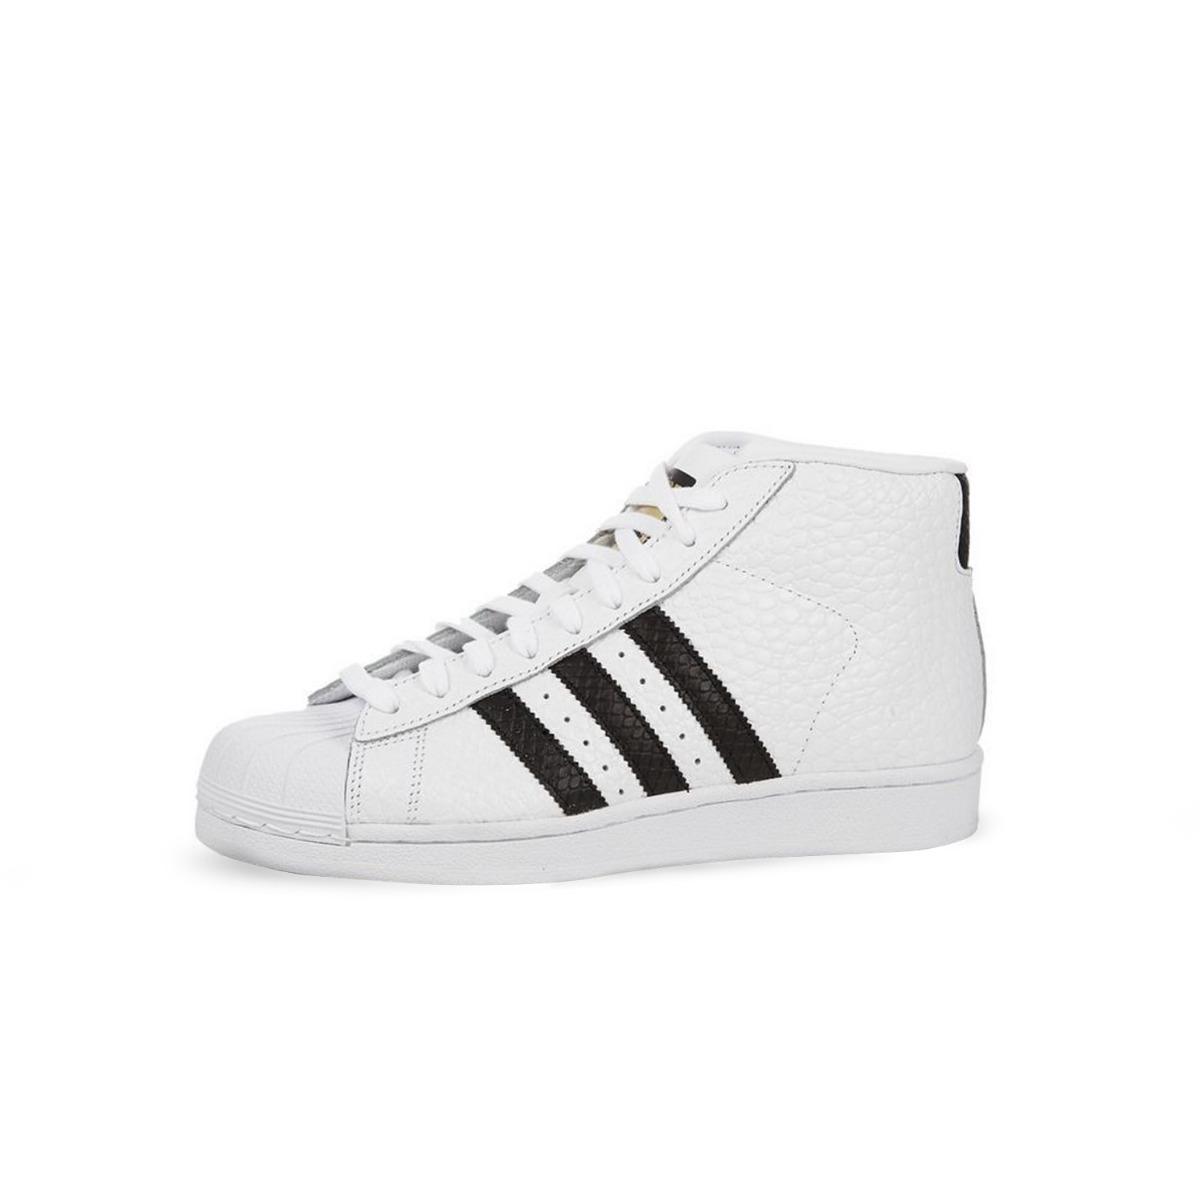 tênis adidas originals pro model animal masculino - original. Carregando  zoom. 0033a3d5d8b37